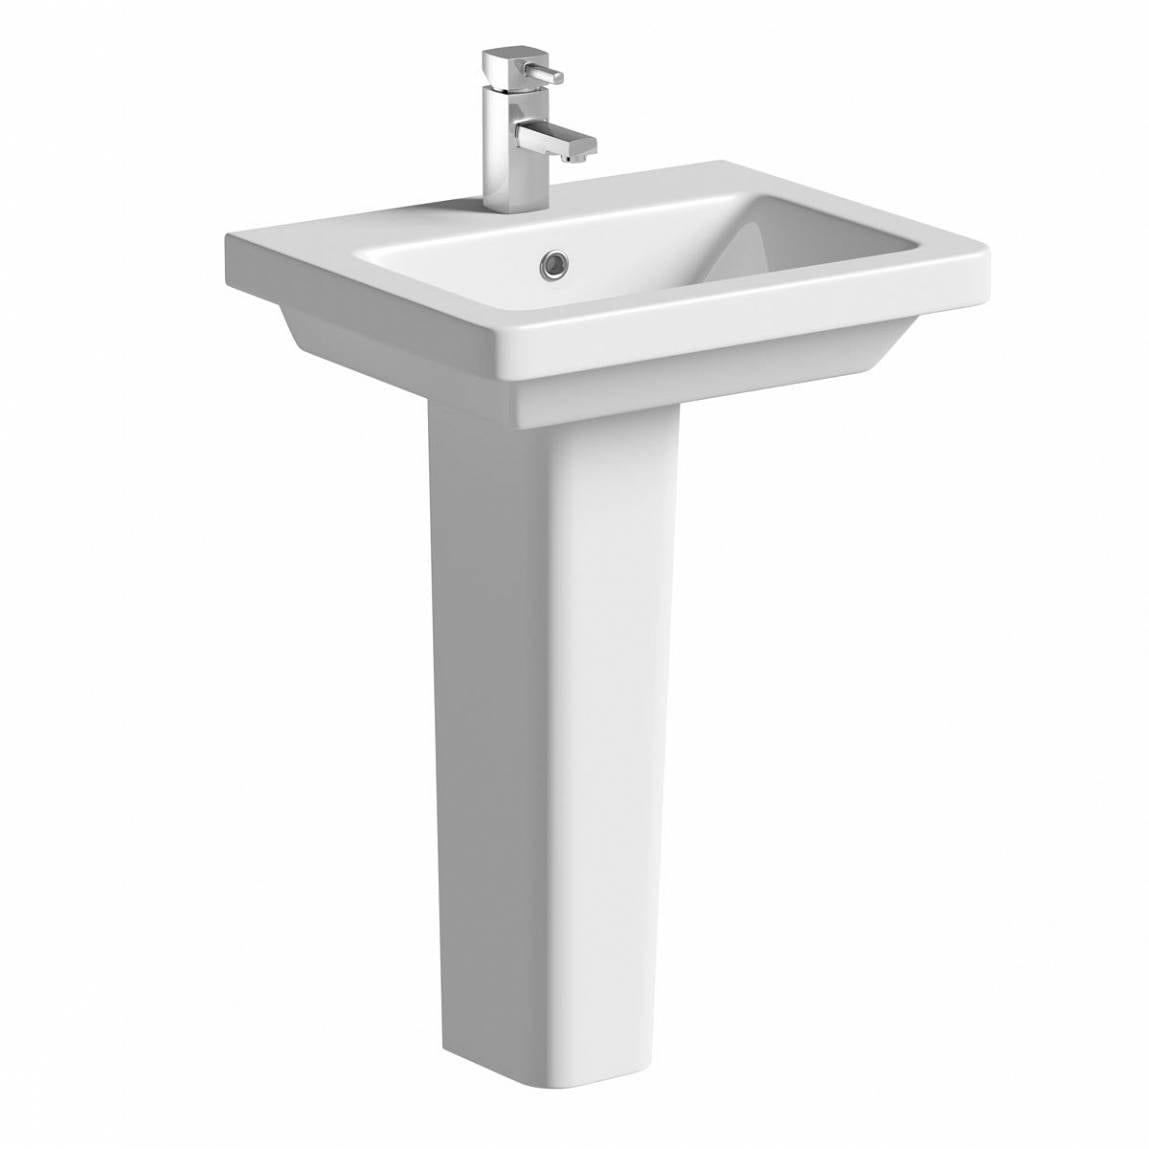 Cooper 1TH 550mm Basin & Pedestal